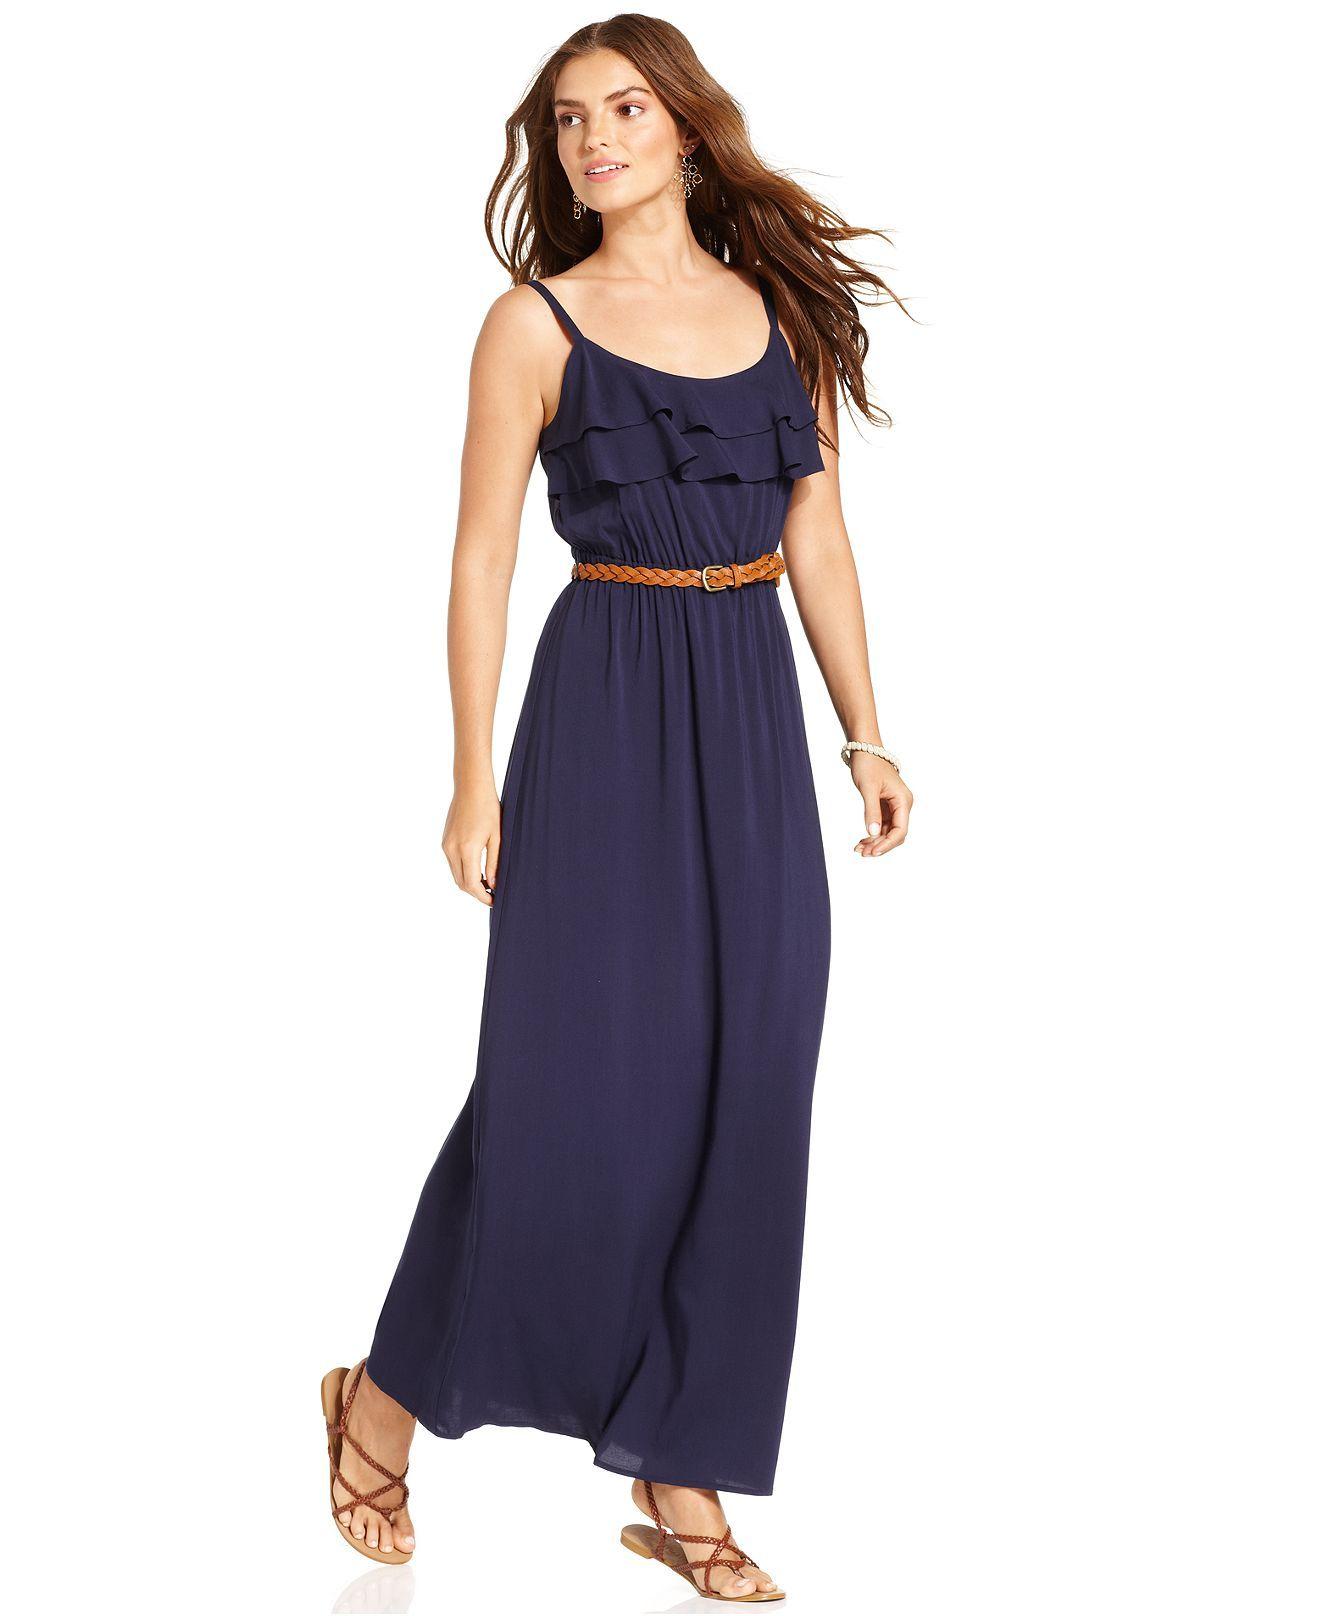 AGB Dress, Spaghetti Strap Ruffle Belted Maxi  - Macy's